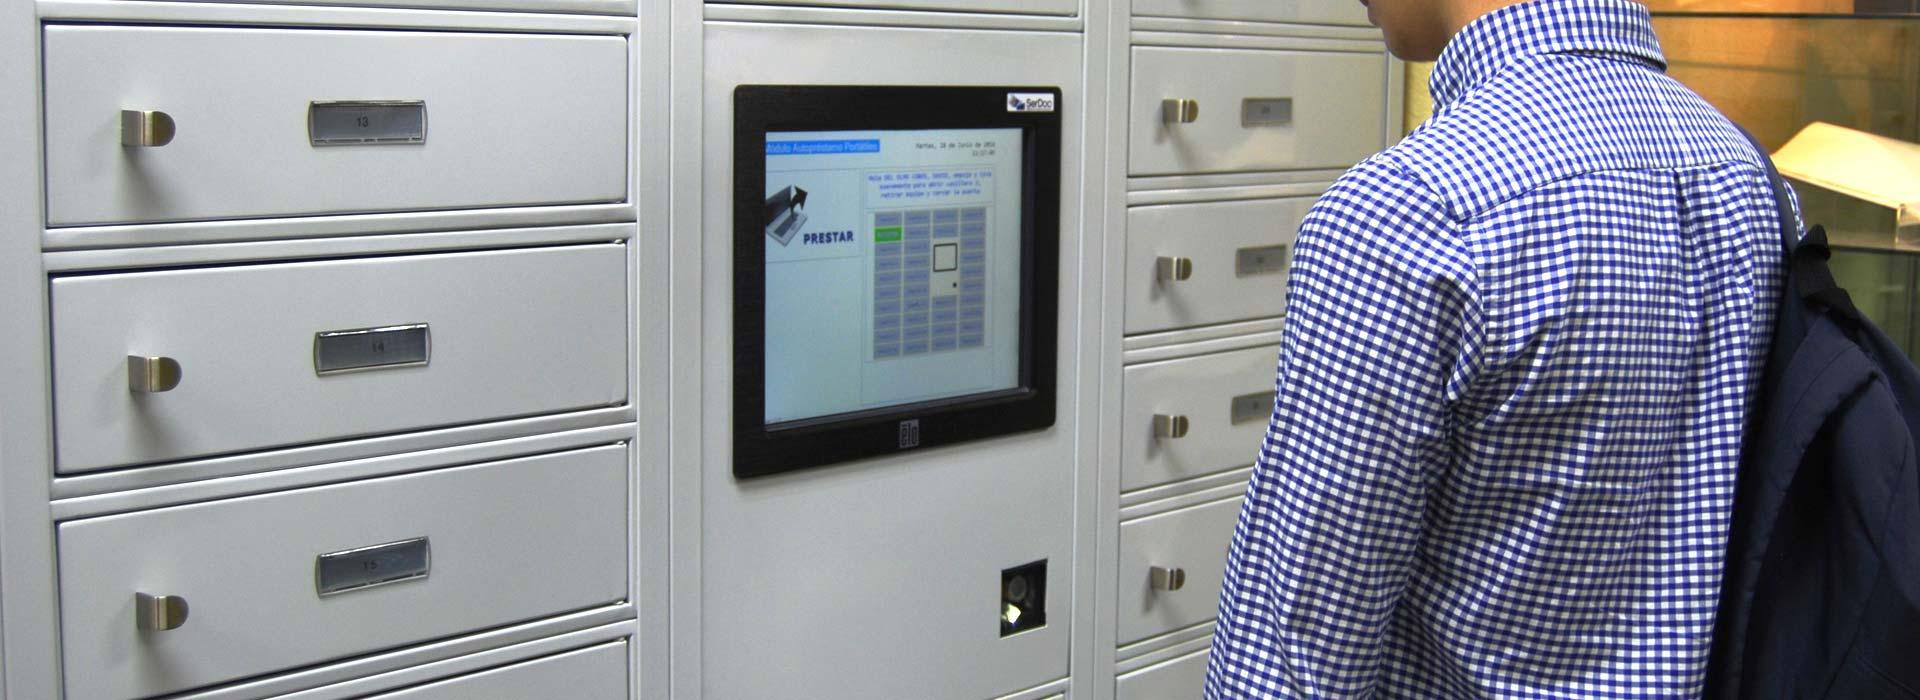 Autopréstamo de portátiles en la UPM por SerDoc